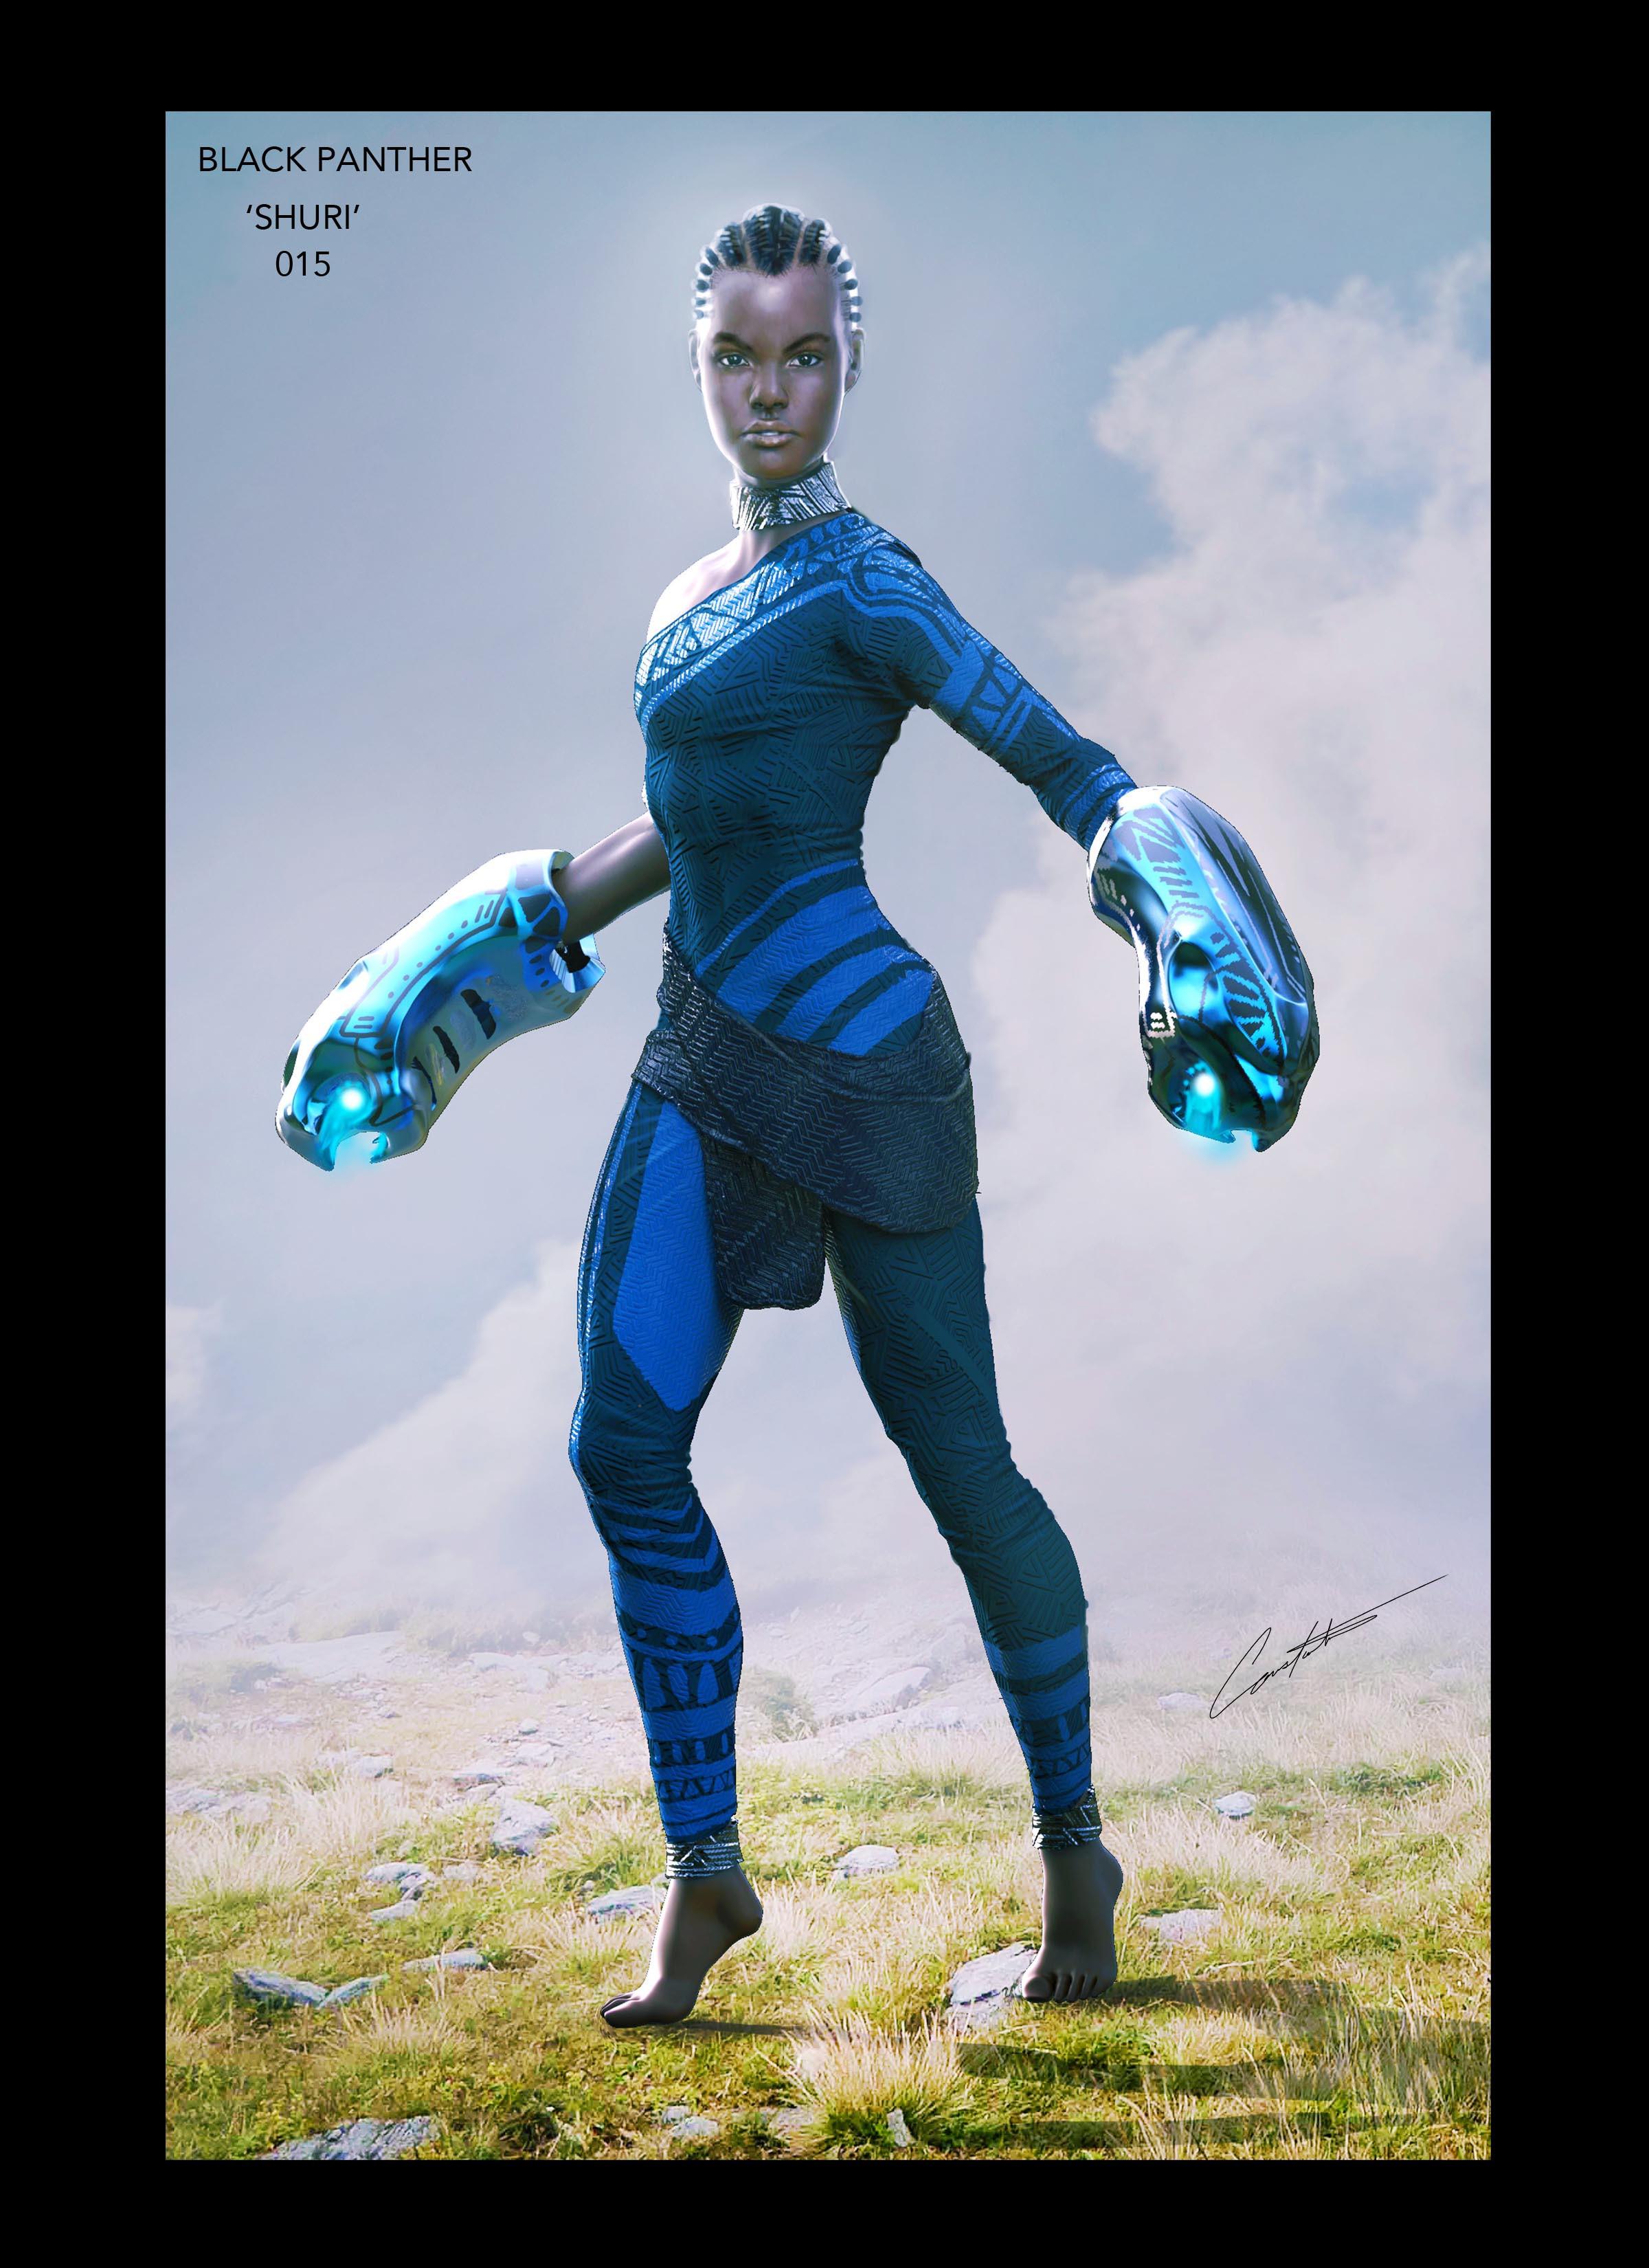 Black Panther 'Shuri' costume concept design